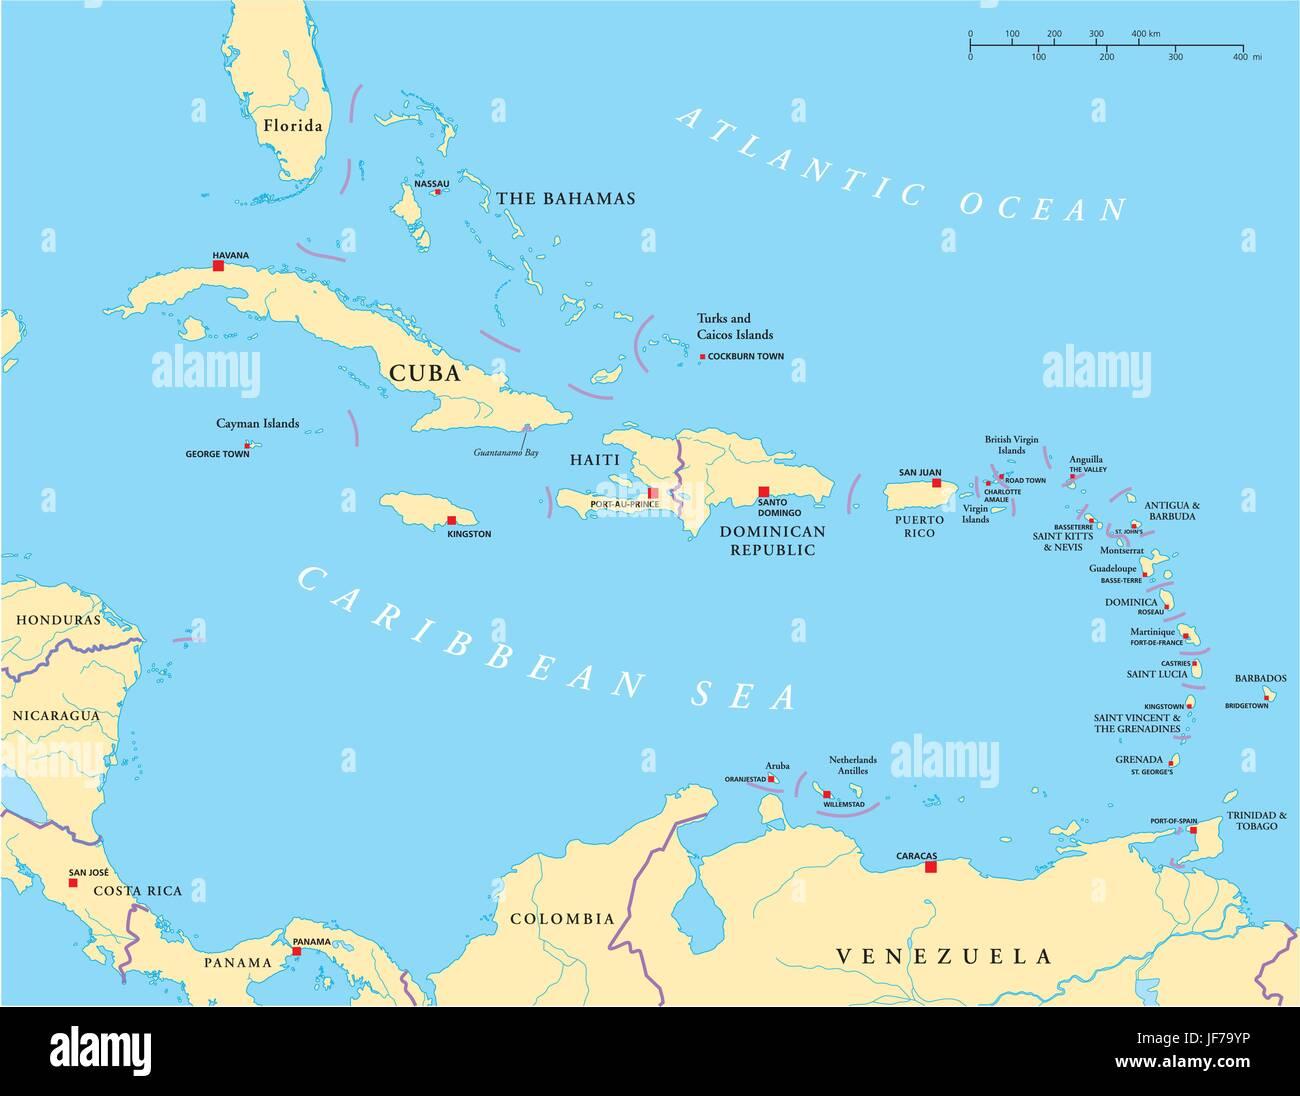 grenada karte Kuba, Antillen, Karibik, Karte, Atlas, Karte der Welt, Grenada  grenada karte